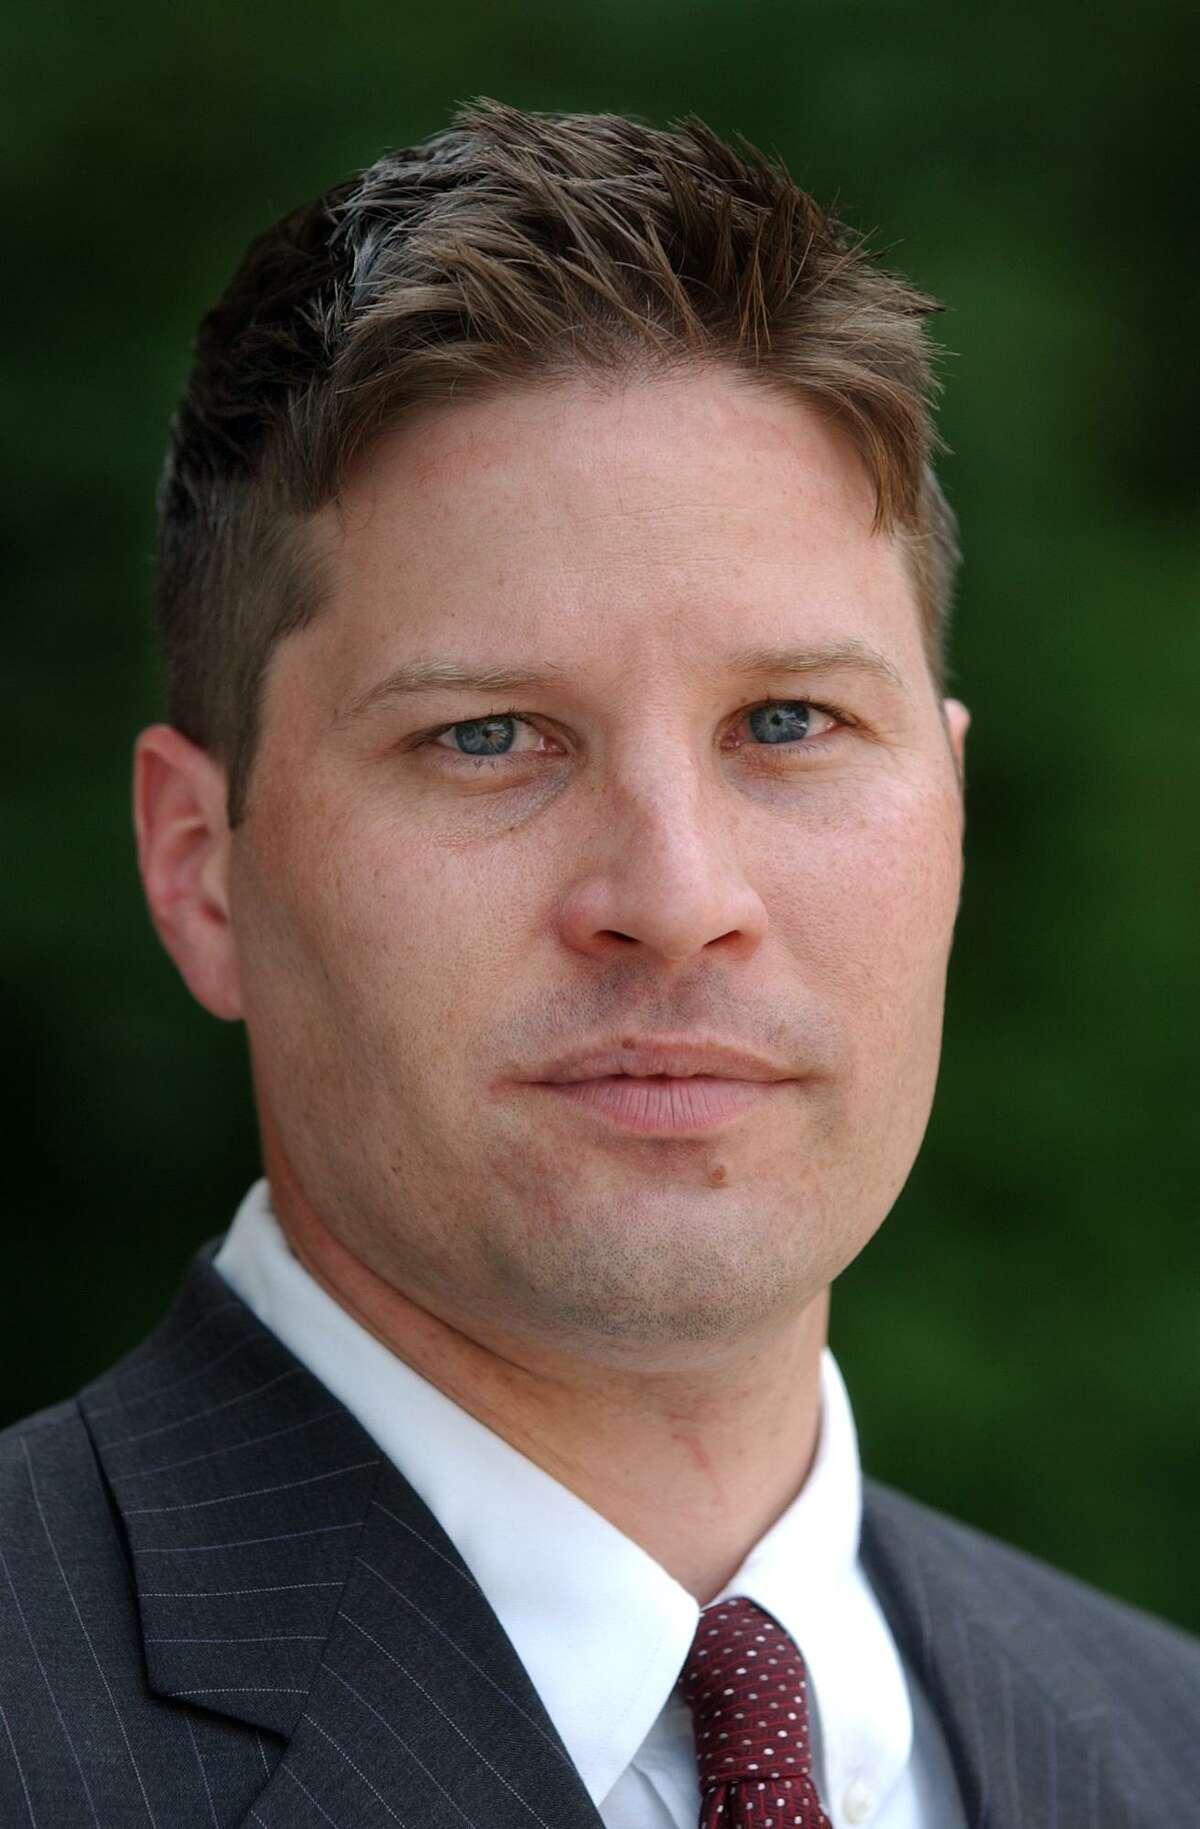 Hamden Police Chief designate Thomas Wydra. Photo by Mara Lavitt